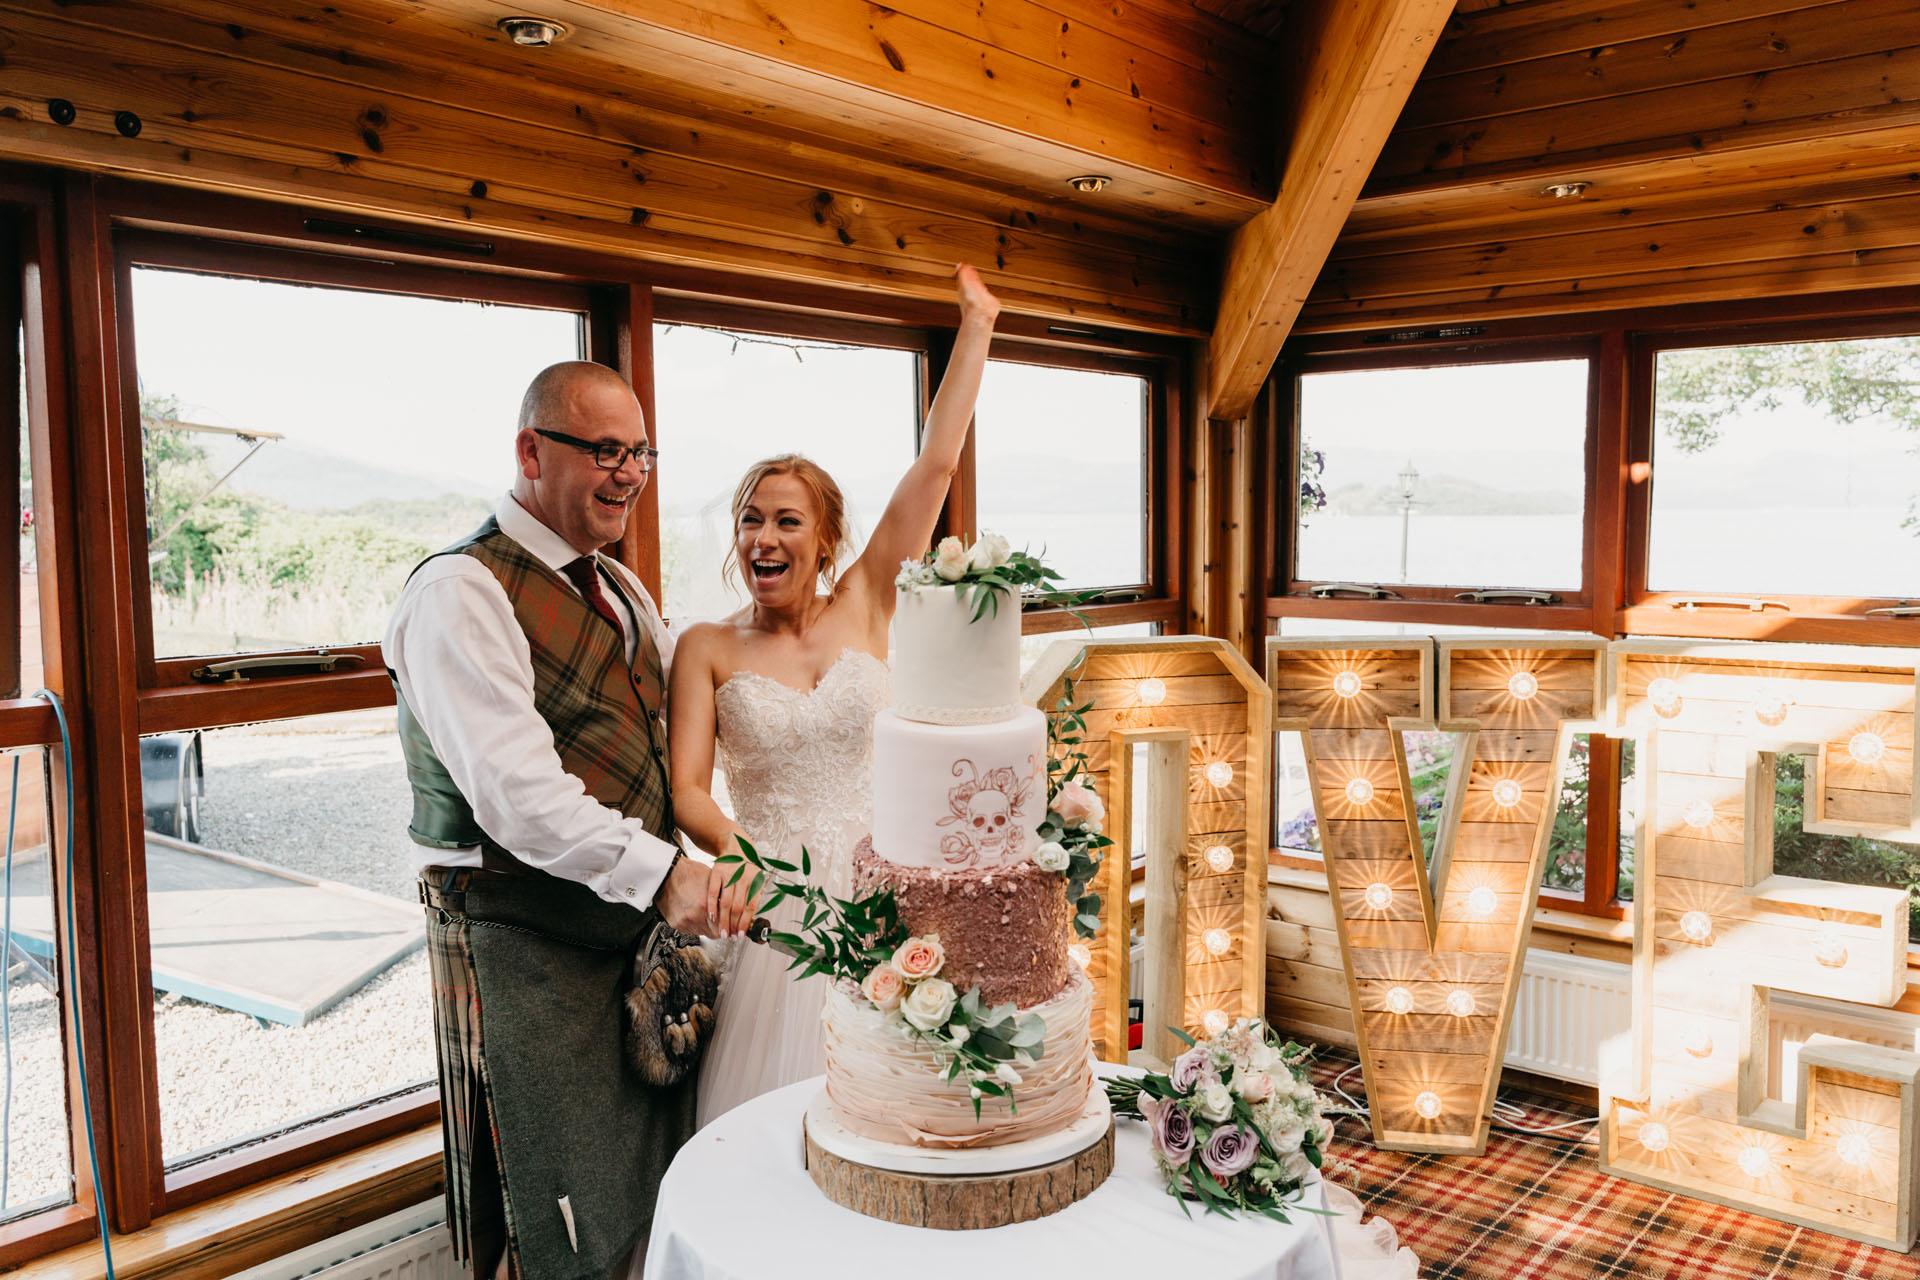 Wedding Photography by Canvas & Peach